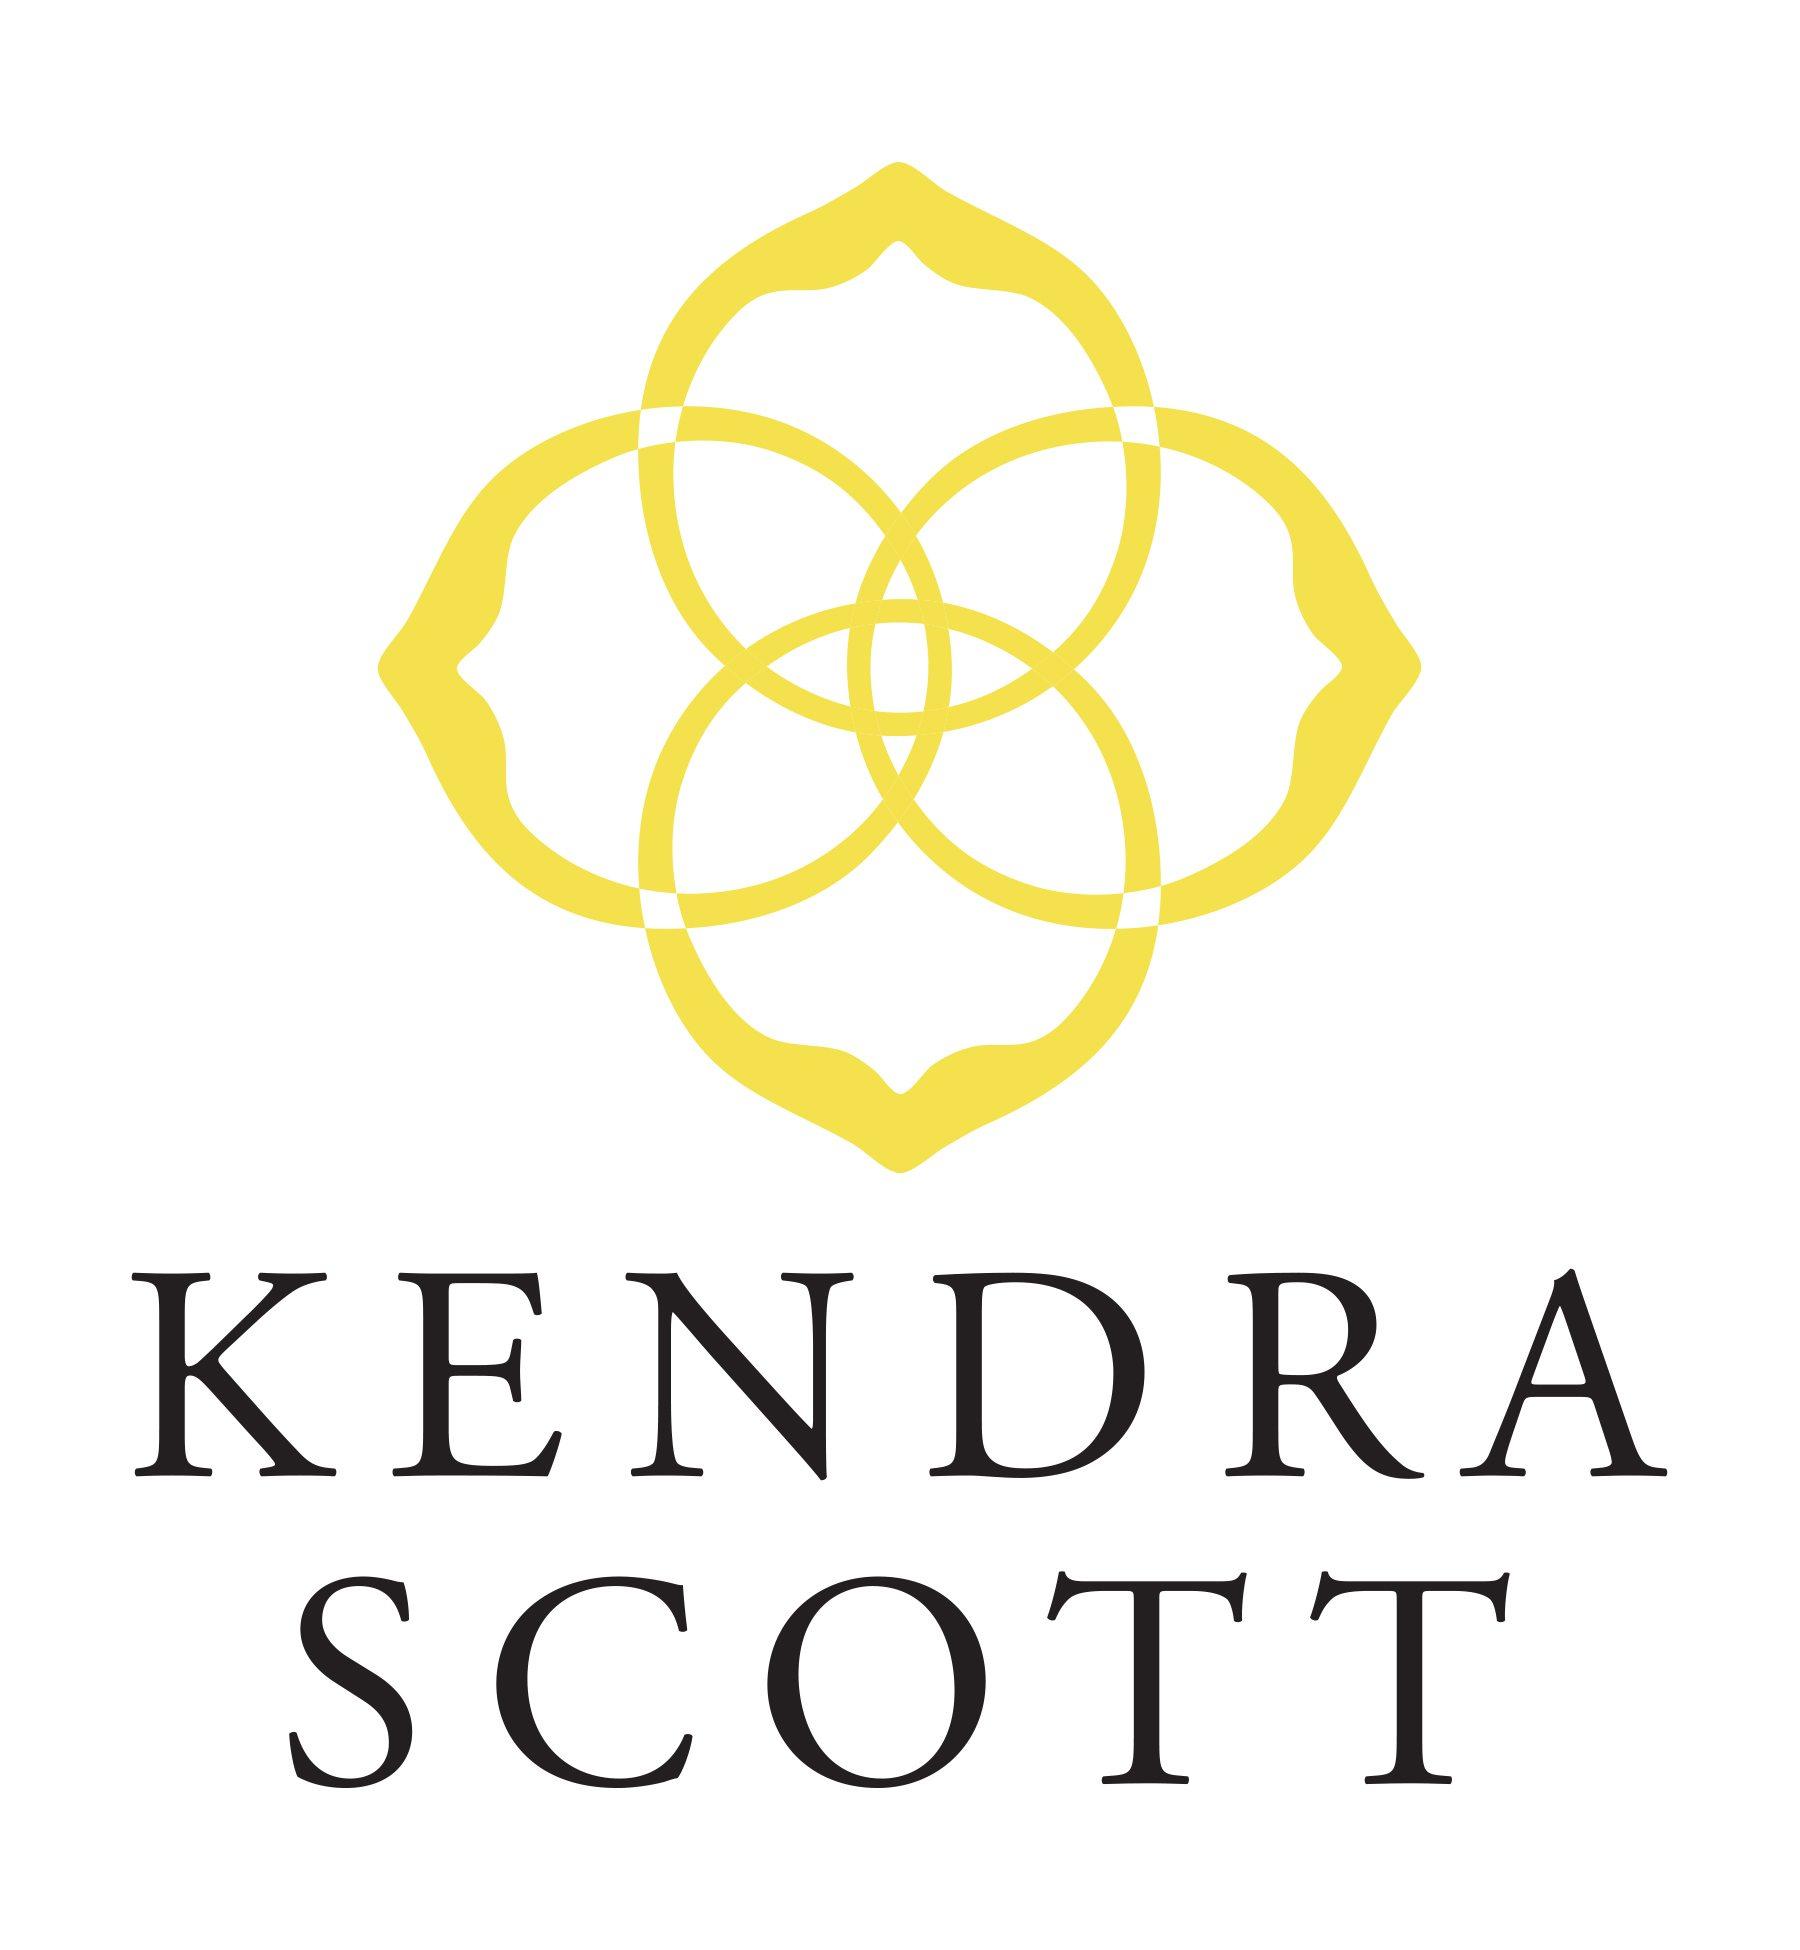 KS-Logo-3-Line-Stacked-Yellow-Medallion-1.jpeg